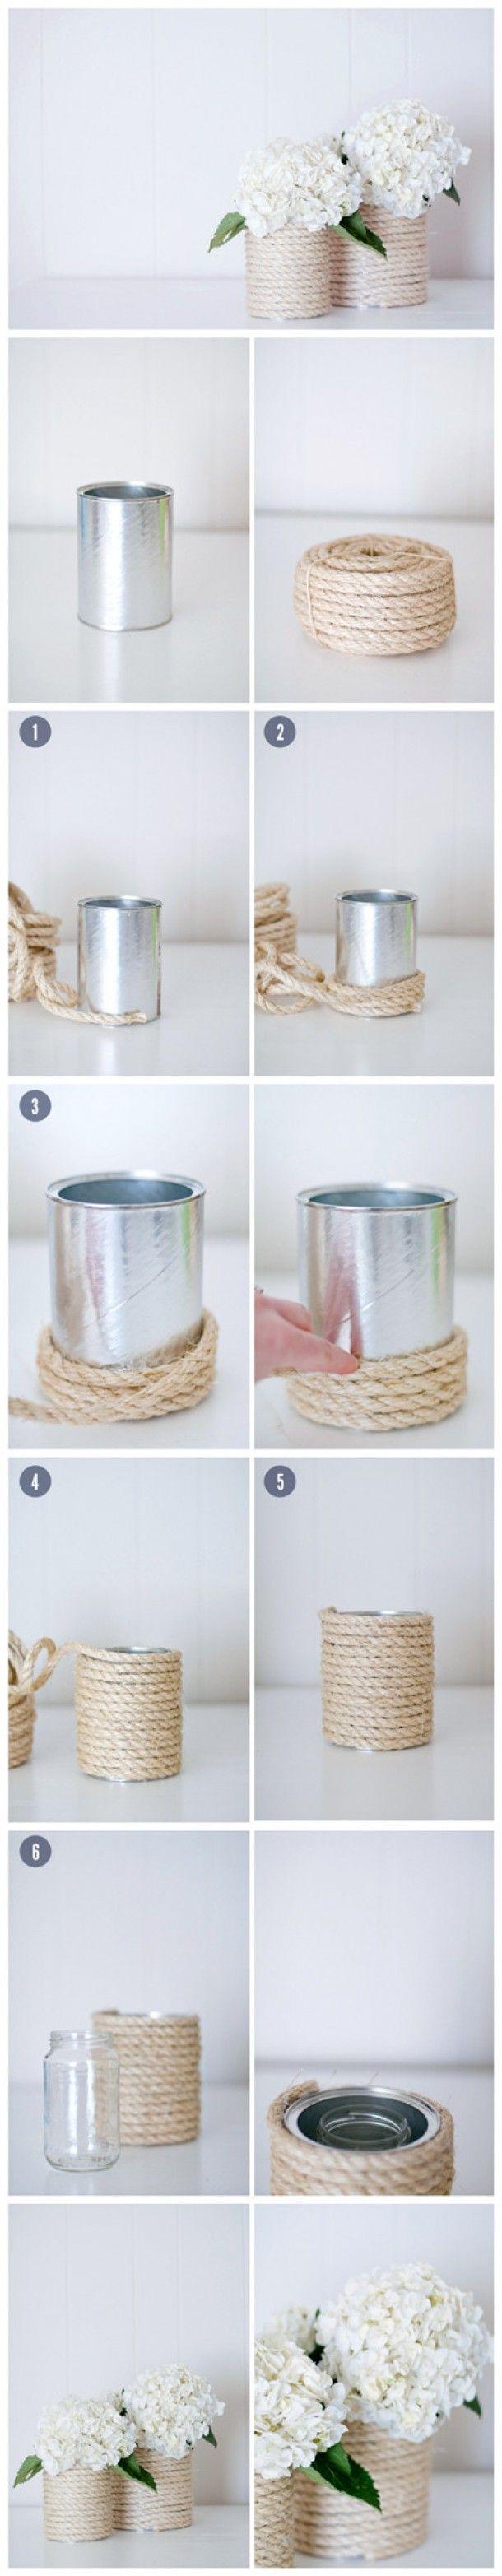 Creatief met touw Door HomebyLinda  For more insipiration visit us at https://facebook.com/theweddingcompanyni or http://www.theweddingcompany.ie